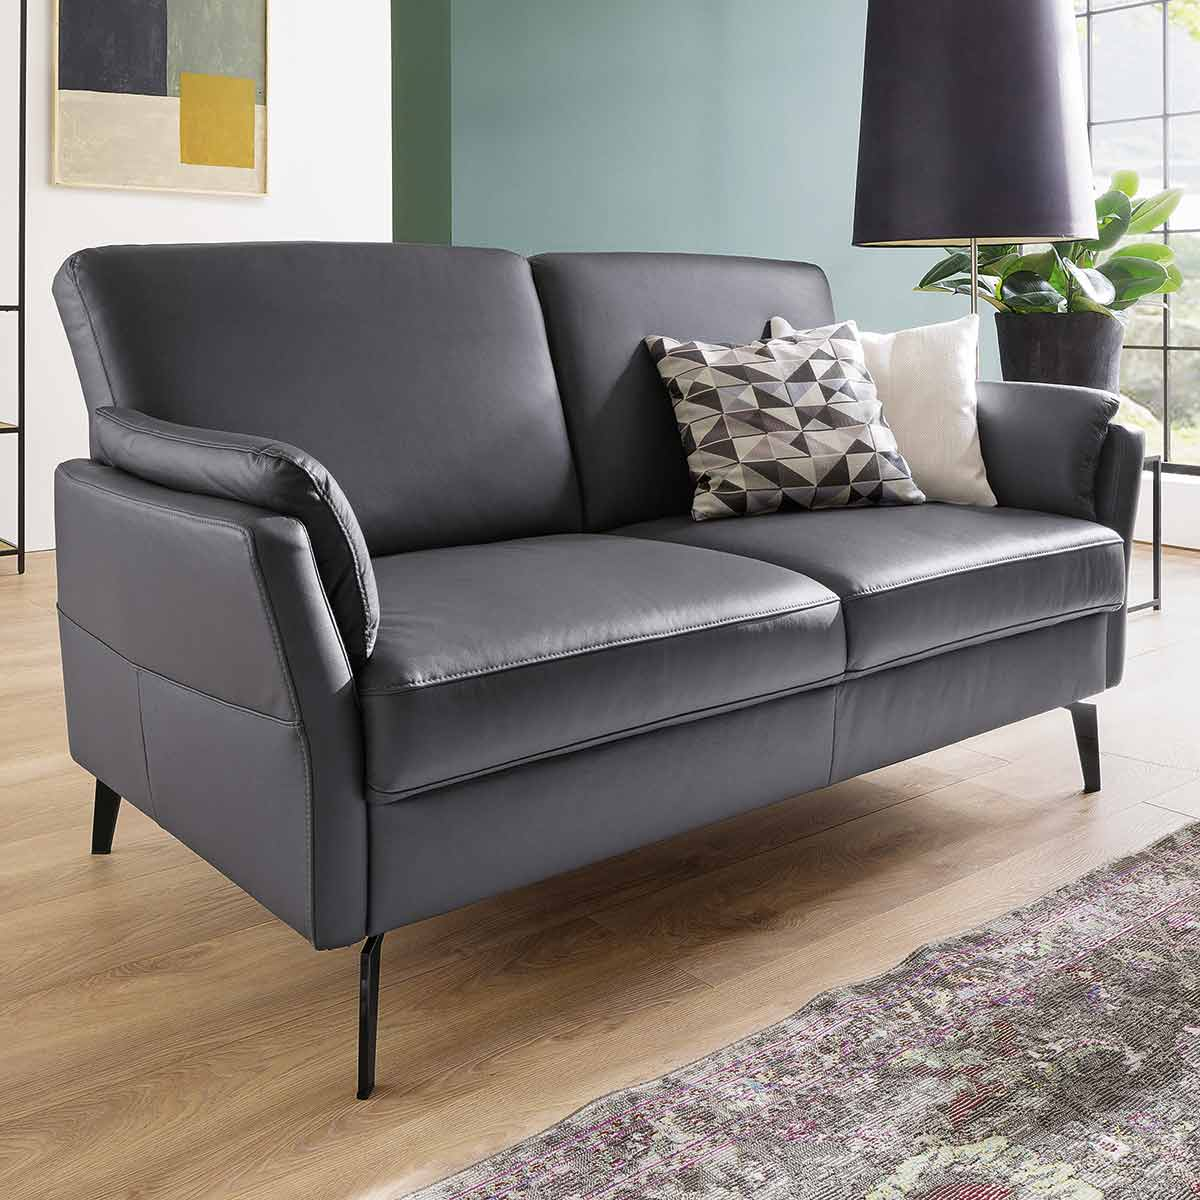 Sofa 12 Sitzer in Leder grau